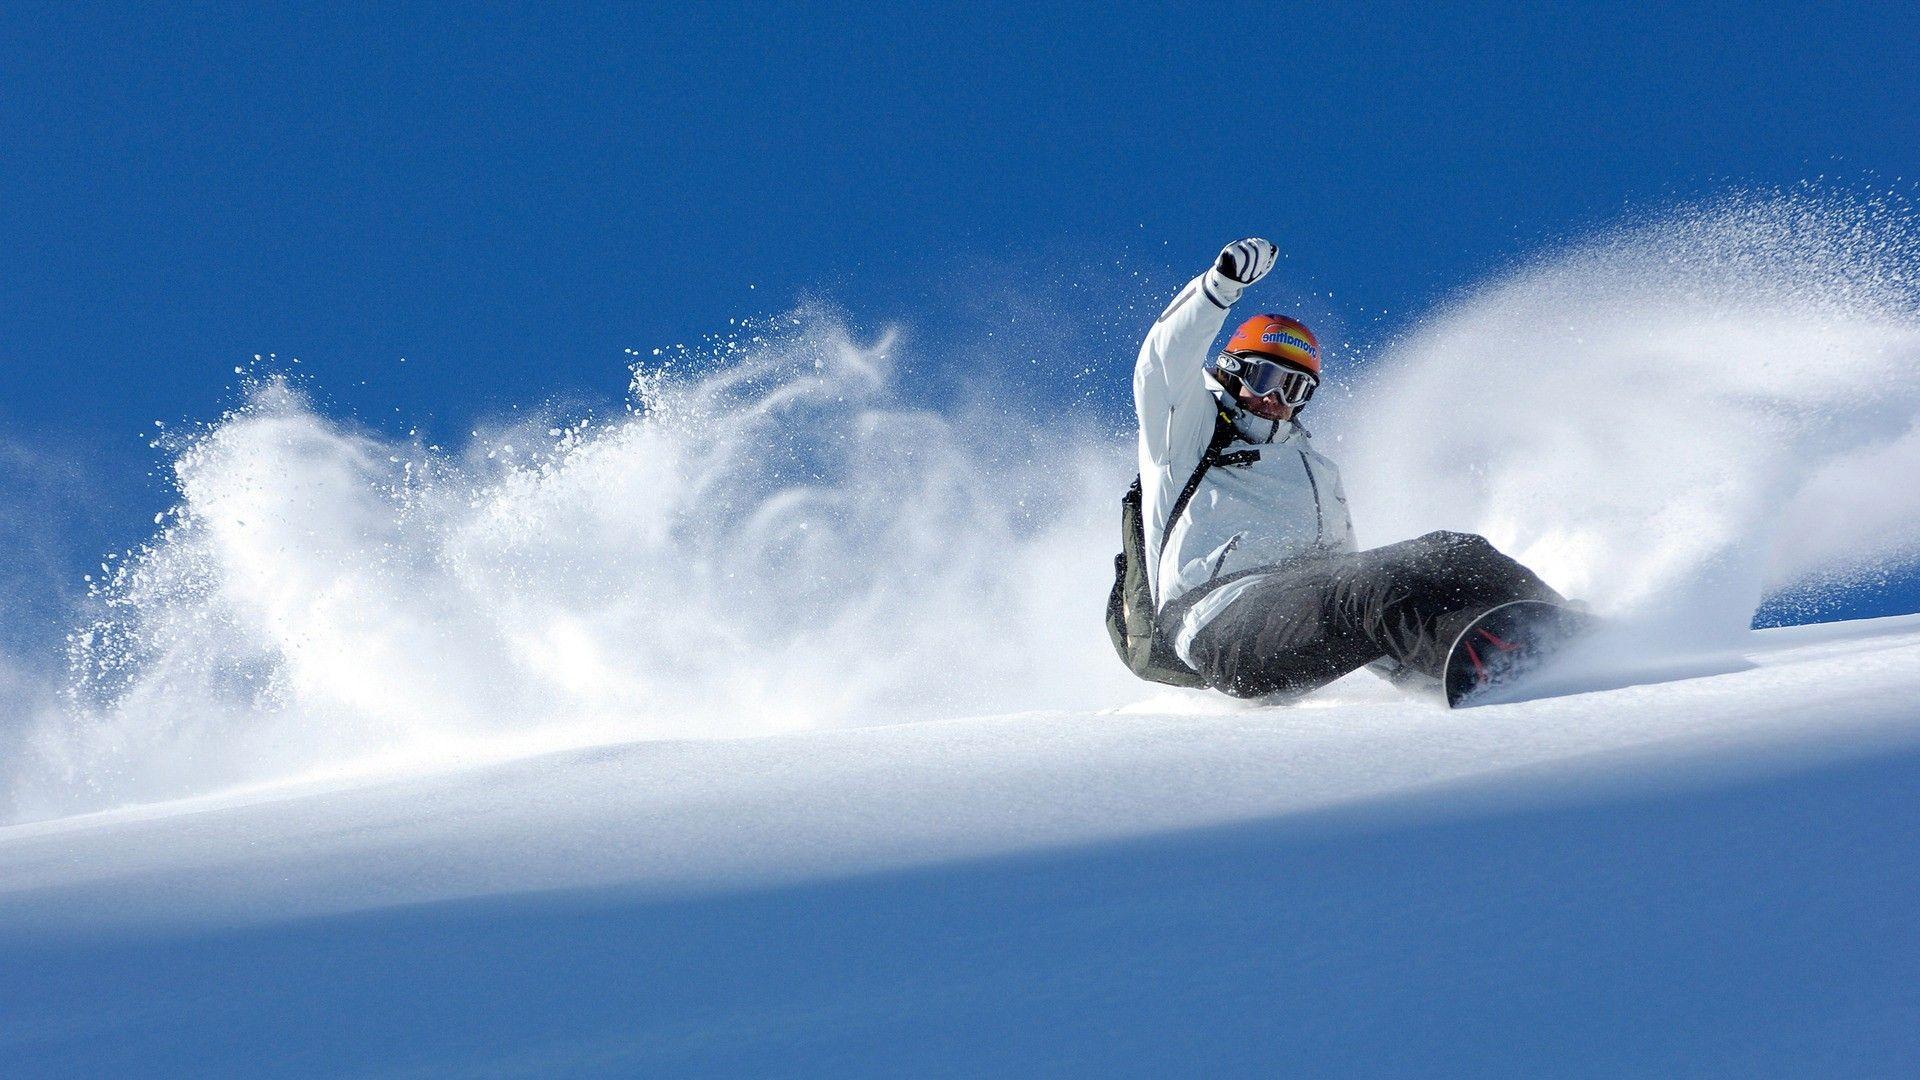 Snowboarding Wallpapers HD – Wallpaper Cave